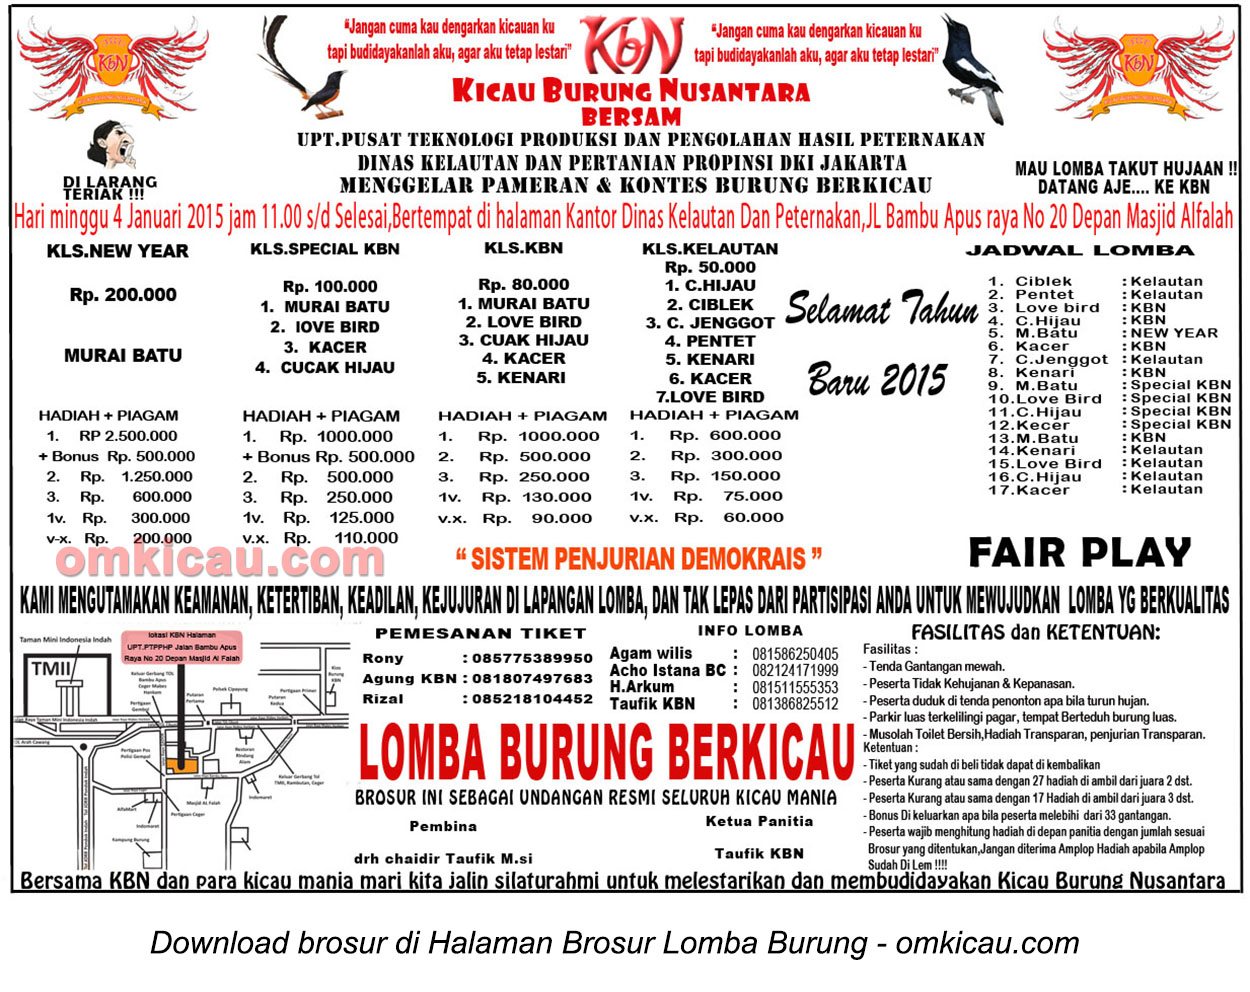 Brosur Lomba Burung Berkicau KBN, Jakarta, 4 Januari 2015